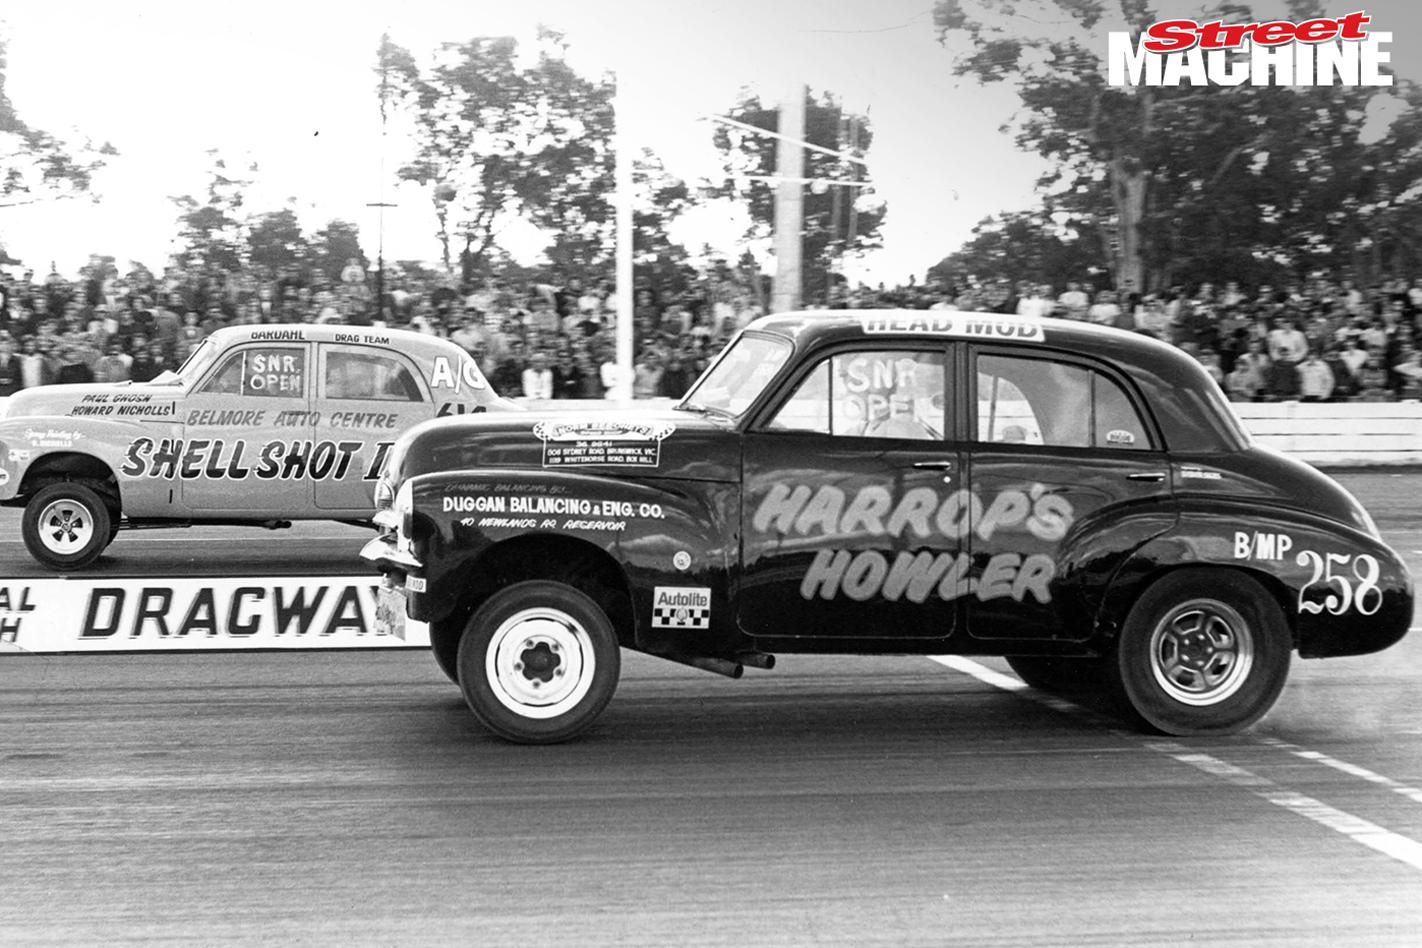 WEB Harrop Howler 22 Nw